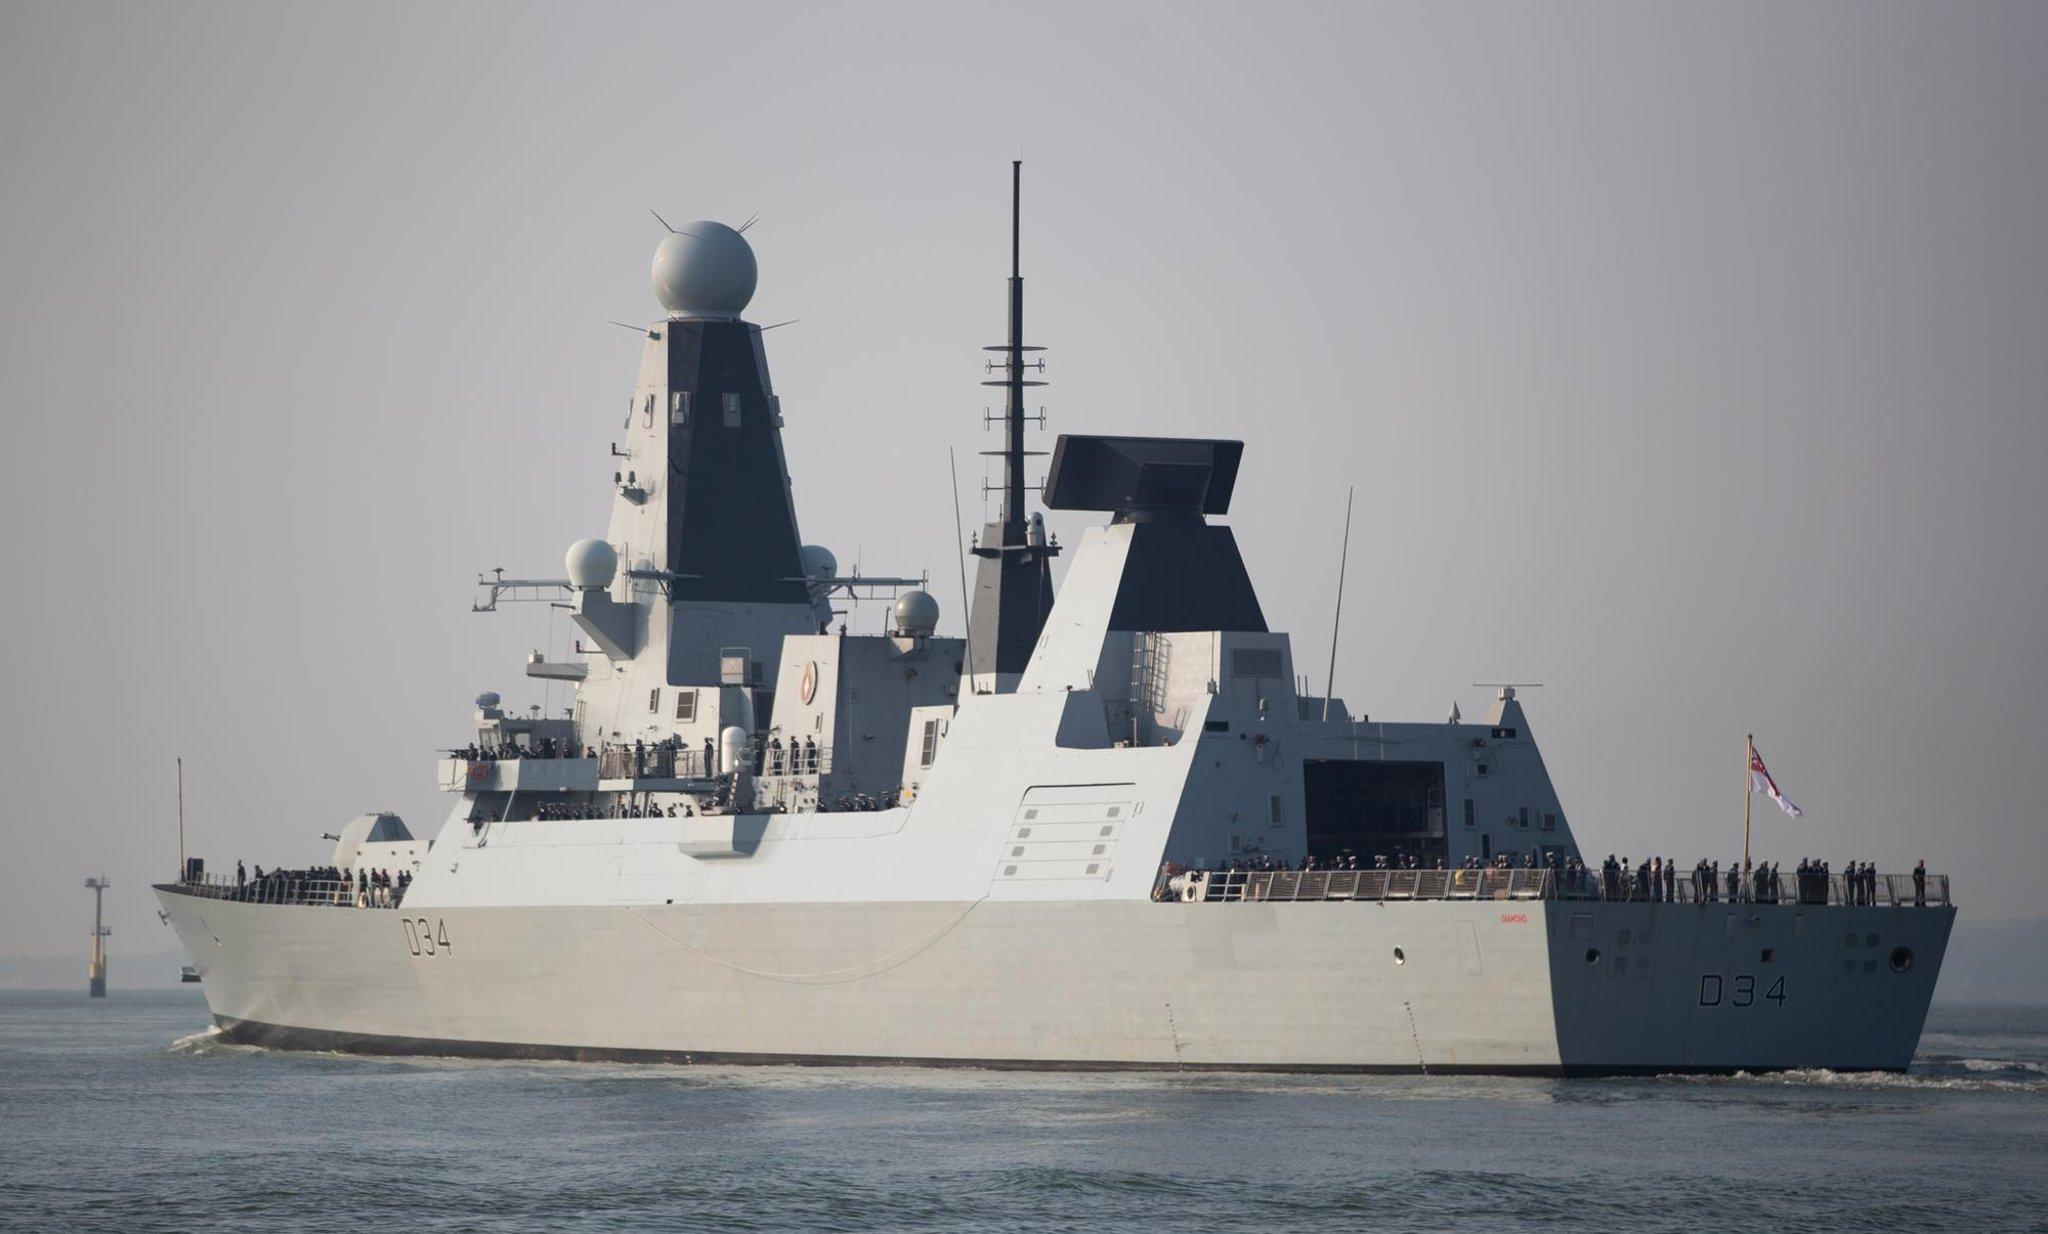 Royal Navy set sail for massive NATO wargame off the coast of Scotland